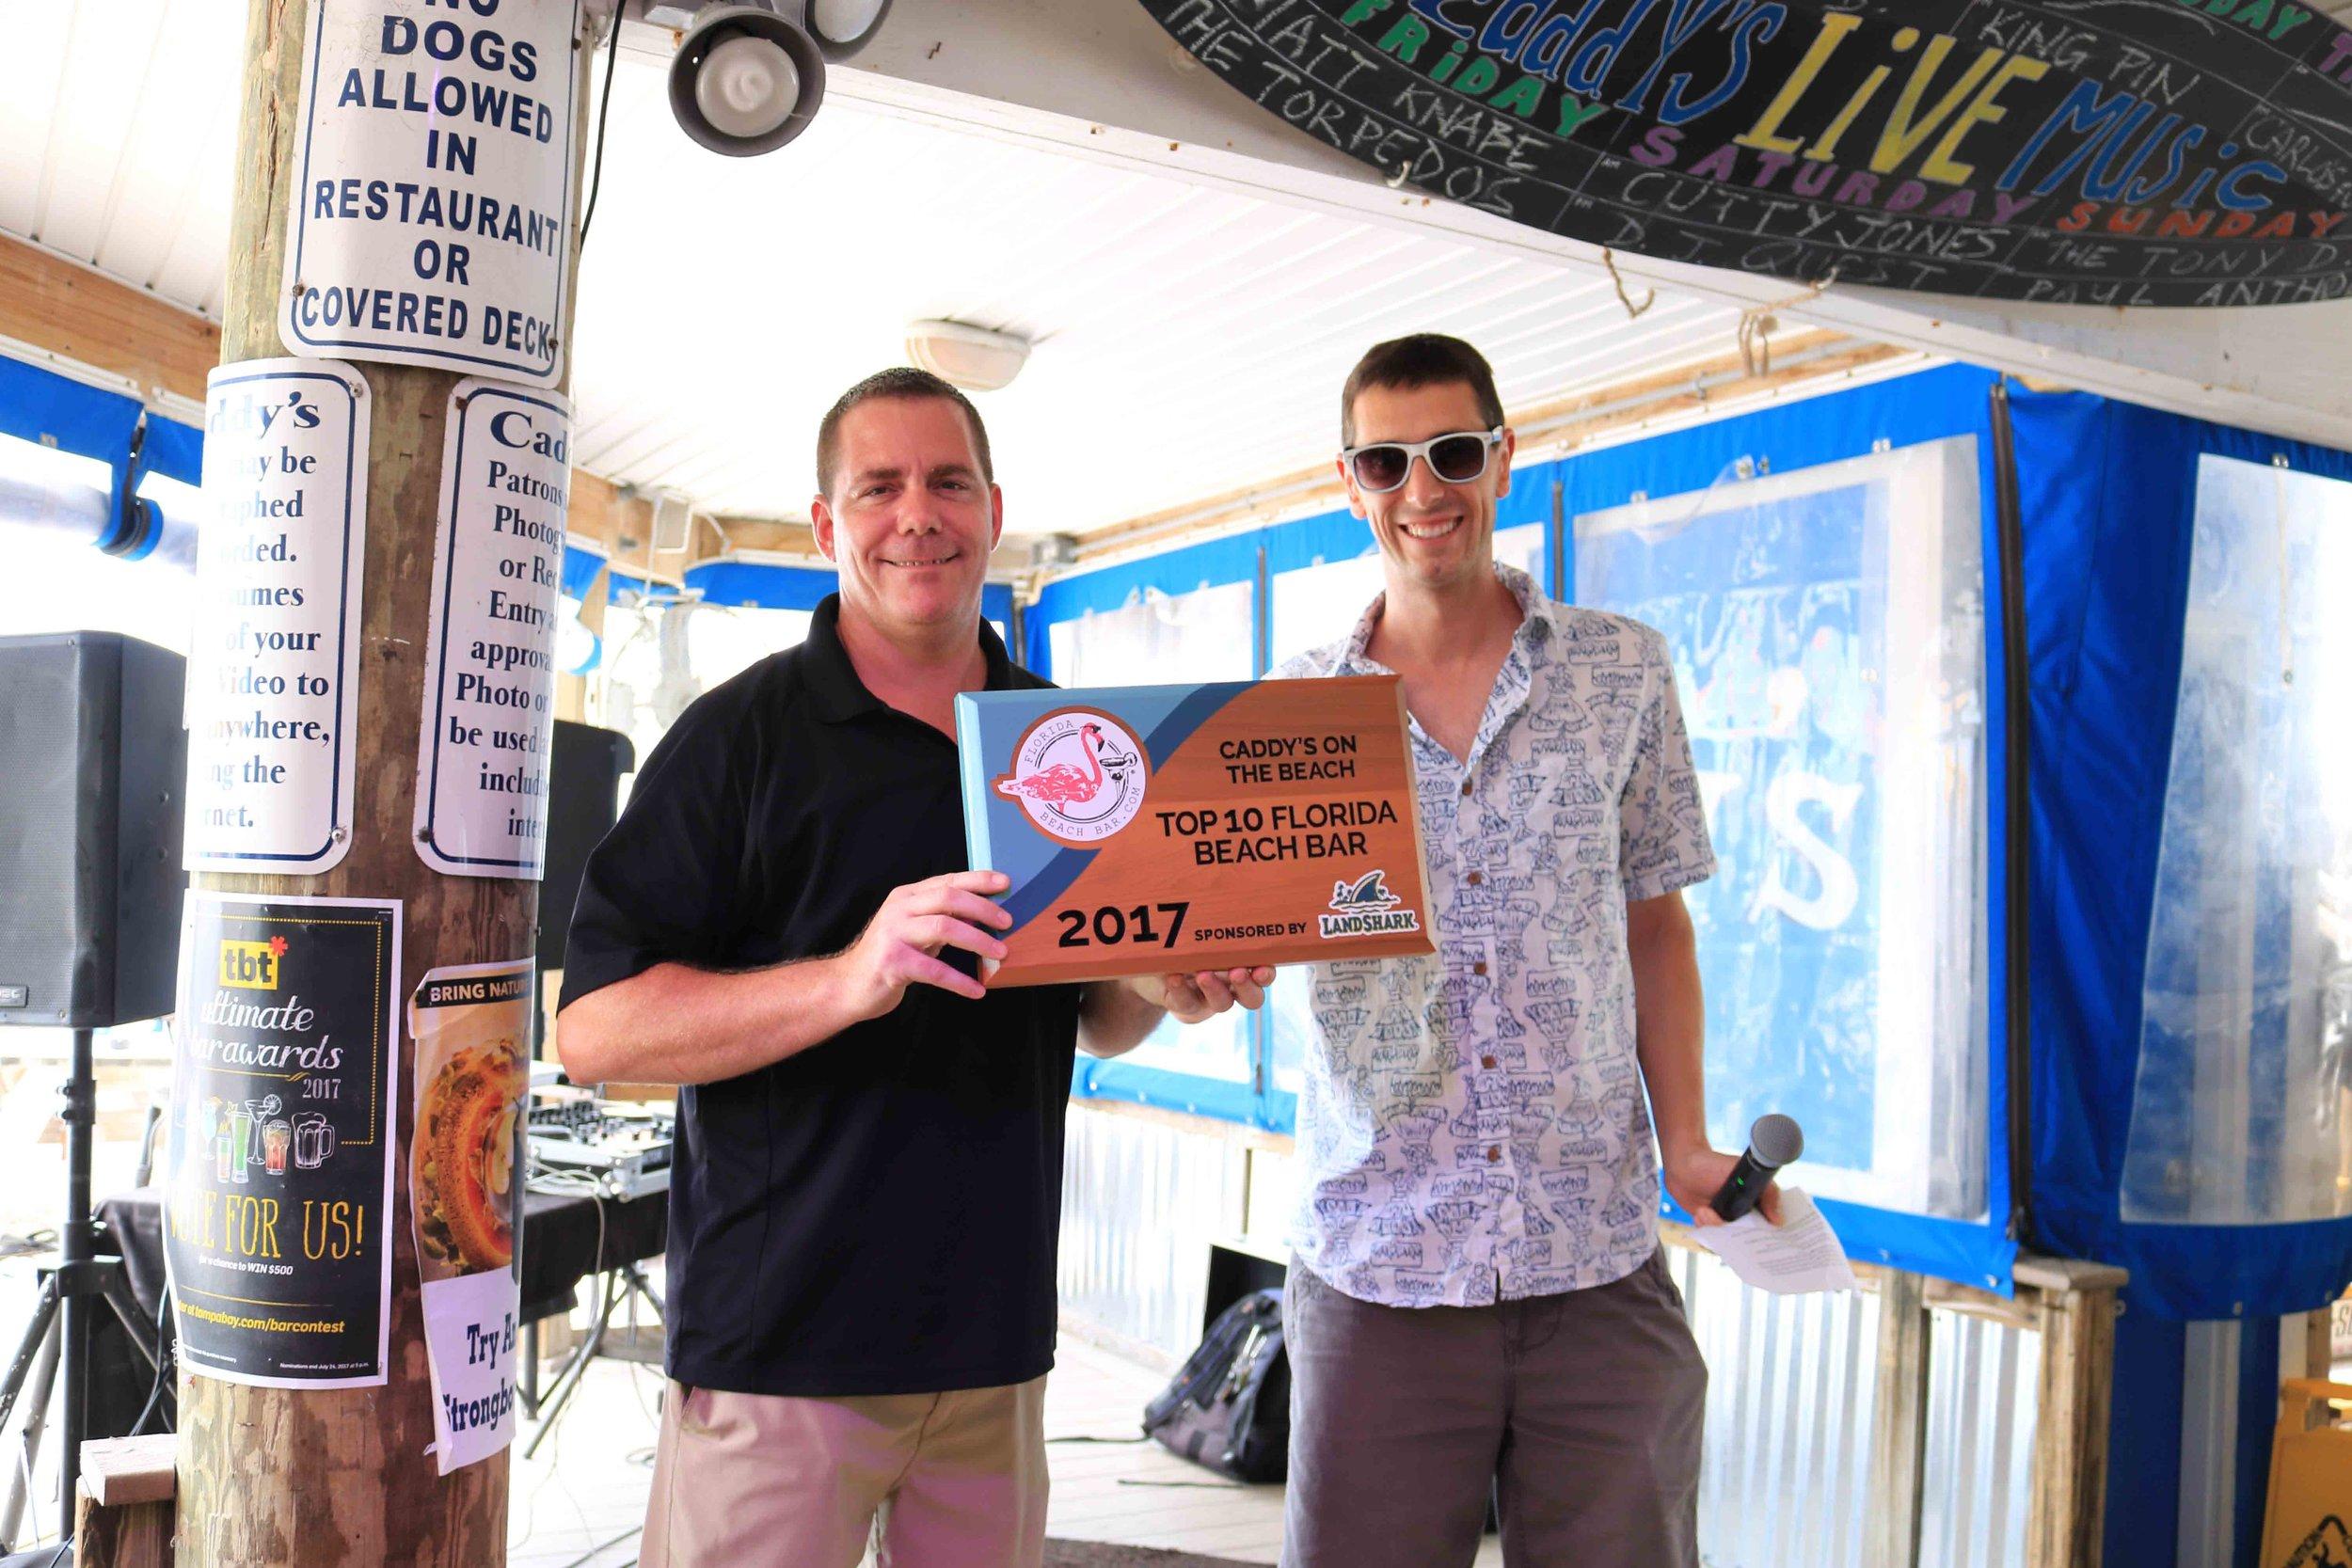 Caddy's General manager, Chris,accepts the 2017 Top 10 Florida Beach Bar award